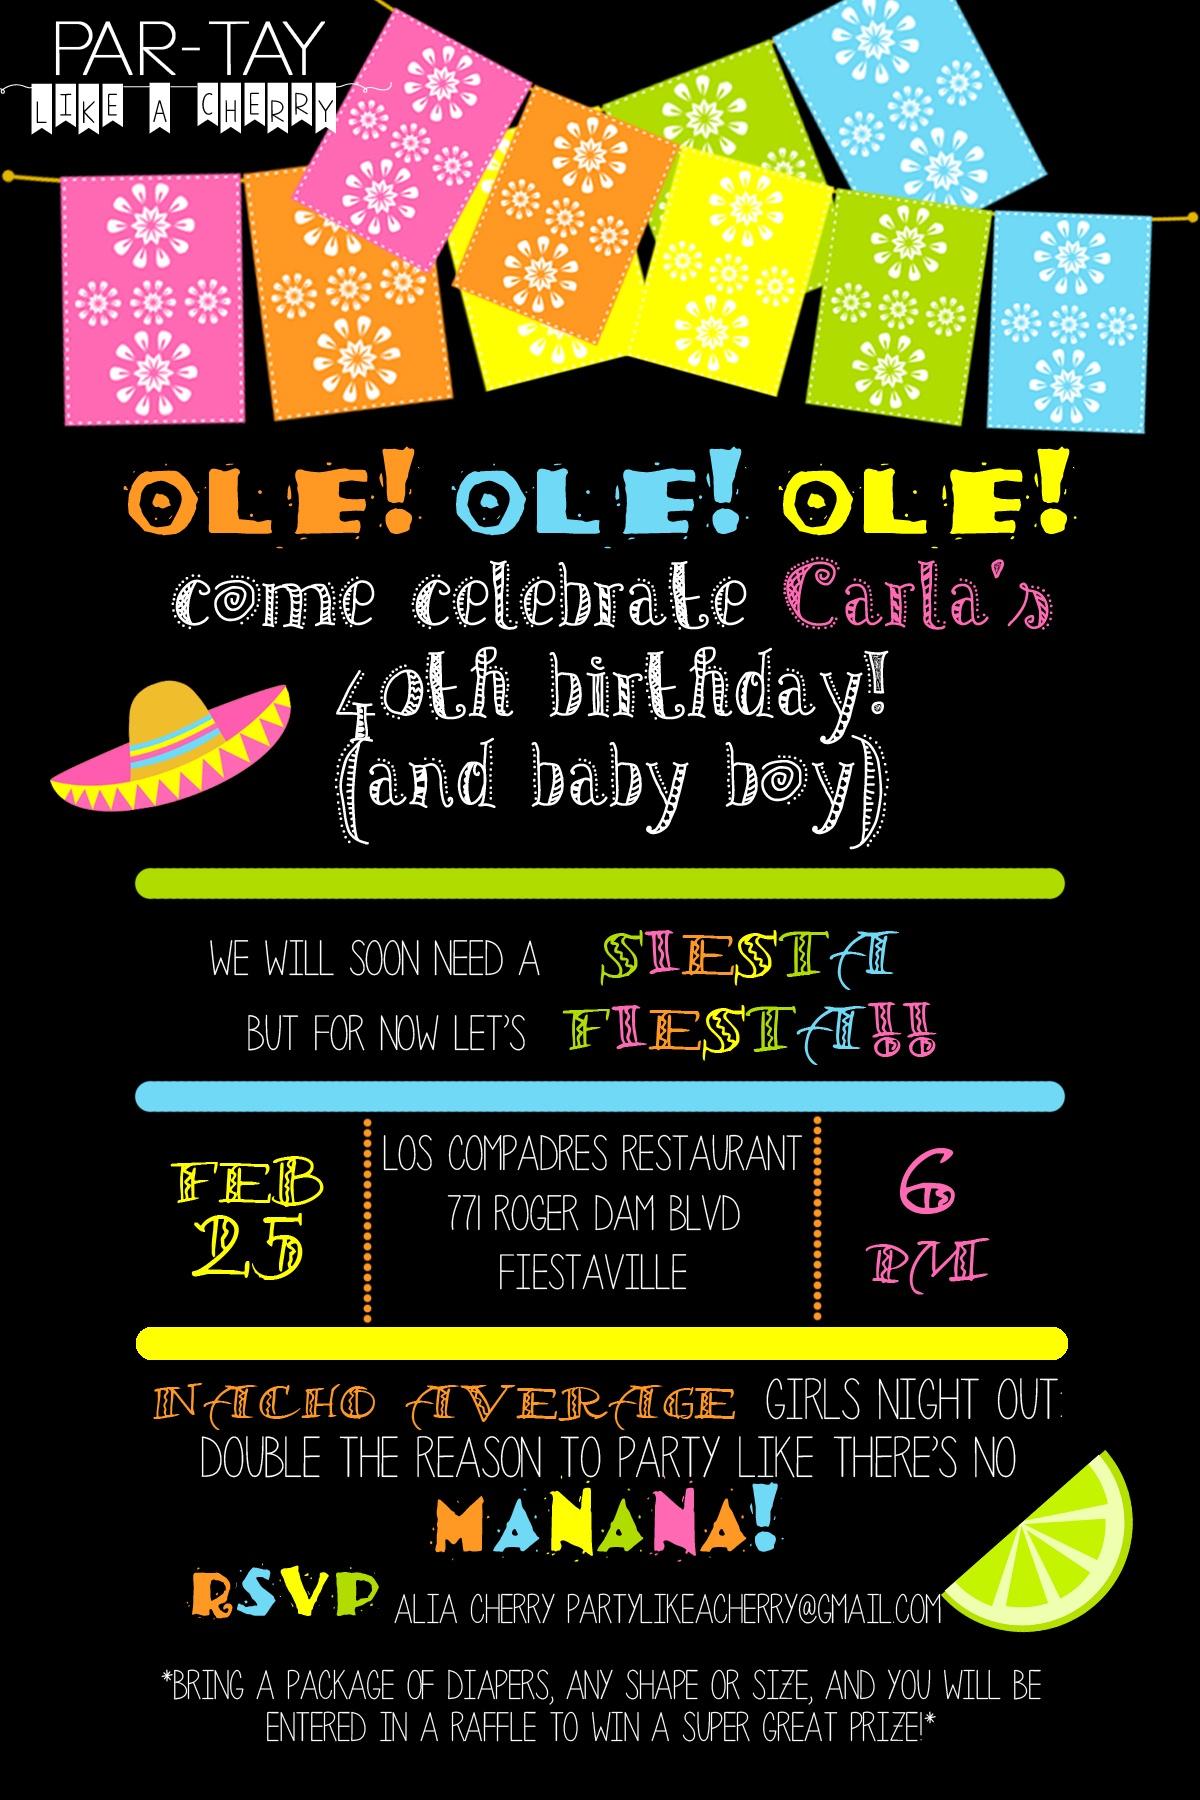 Free Editable Fiesta Invitation - Party Like A Cherry - Free Printable Fiesta Invitations